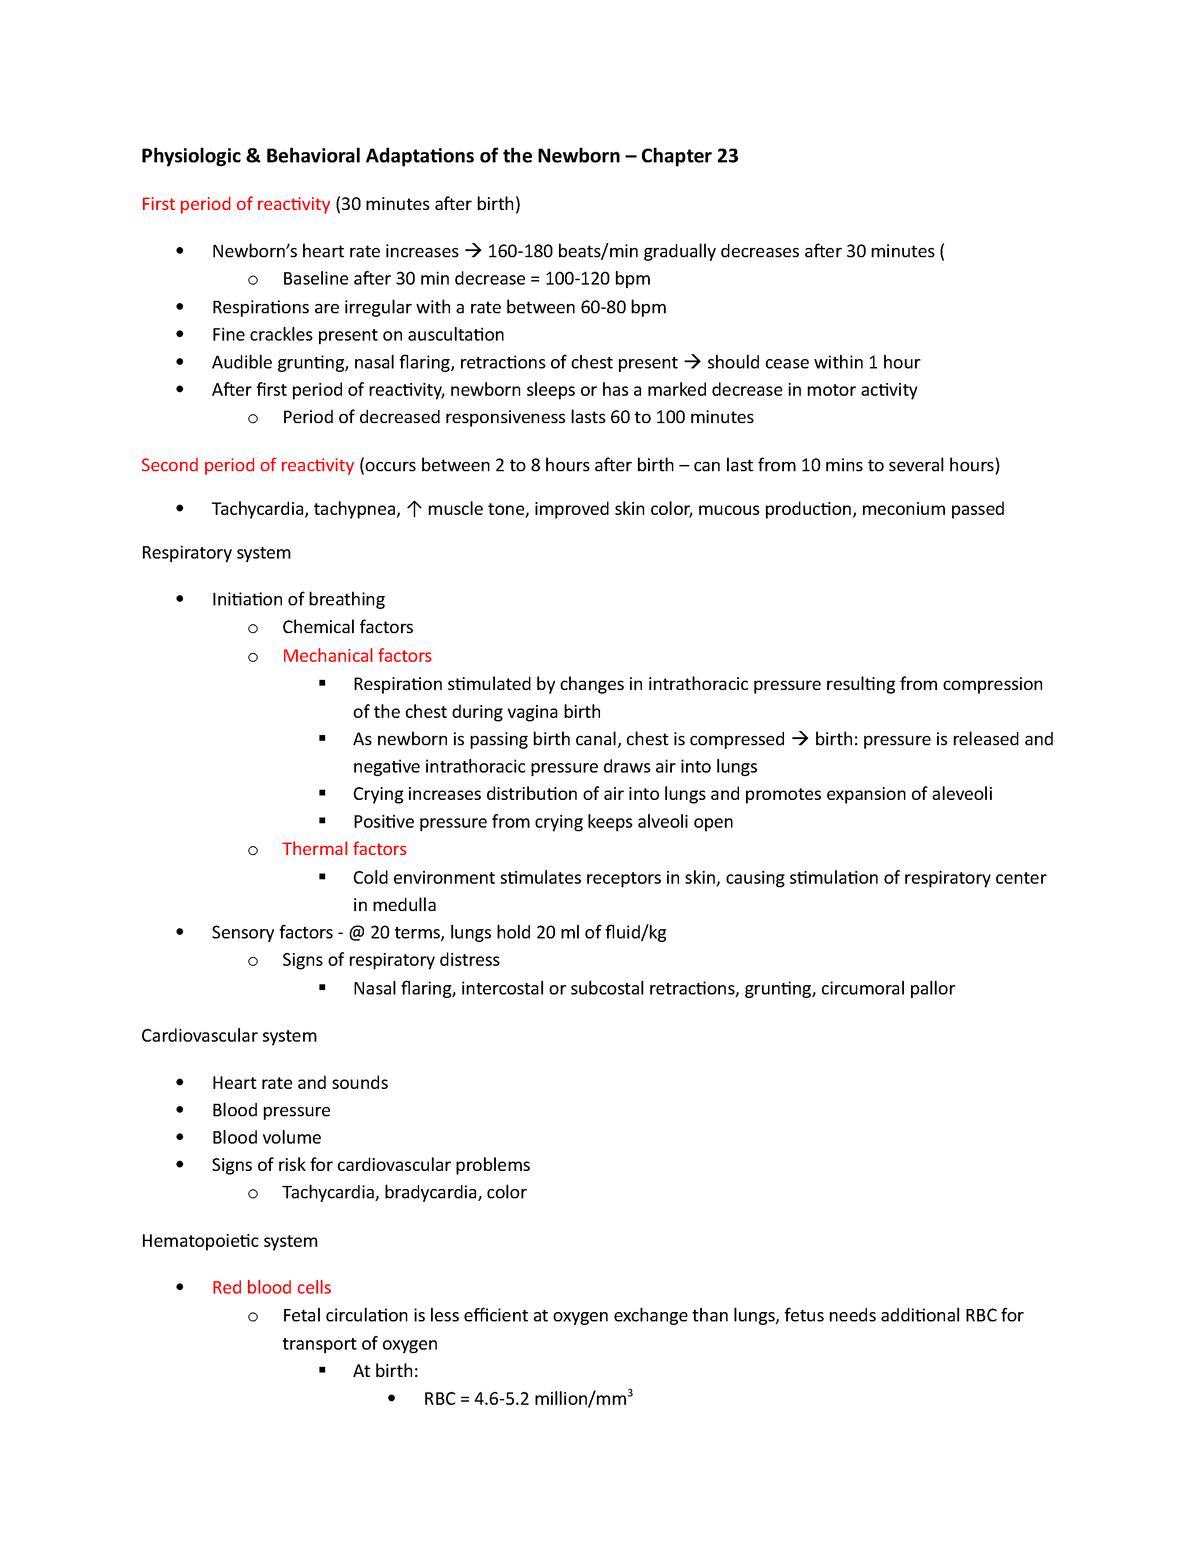 OB Lecture Notes - Week 6 - NSG 440: Maternal Health Nursing